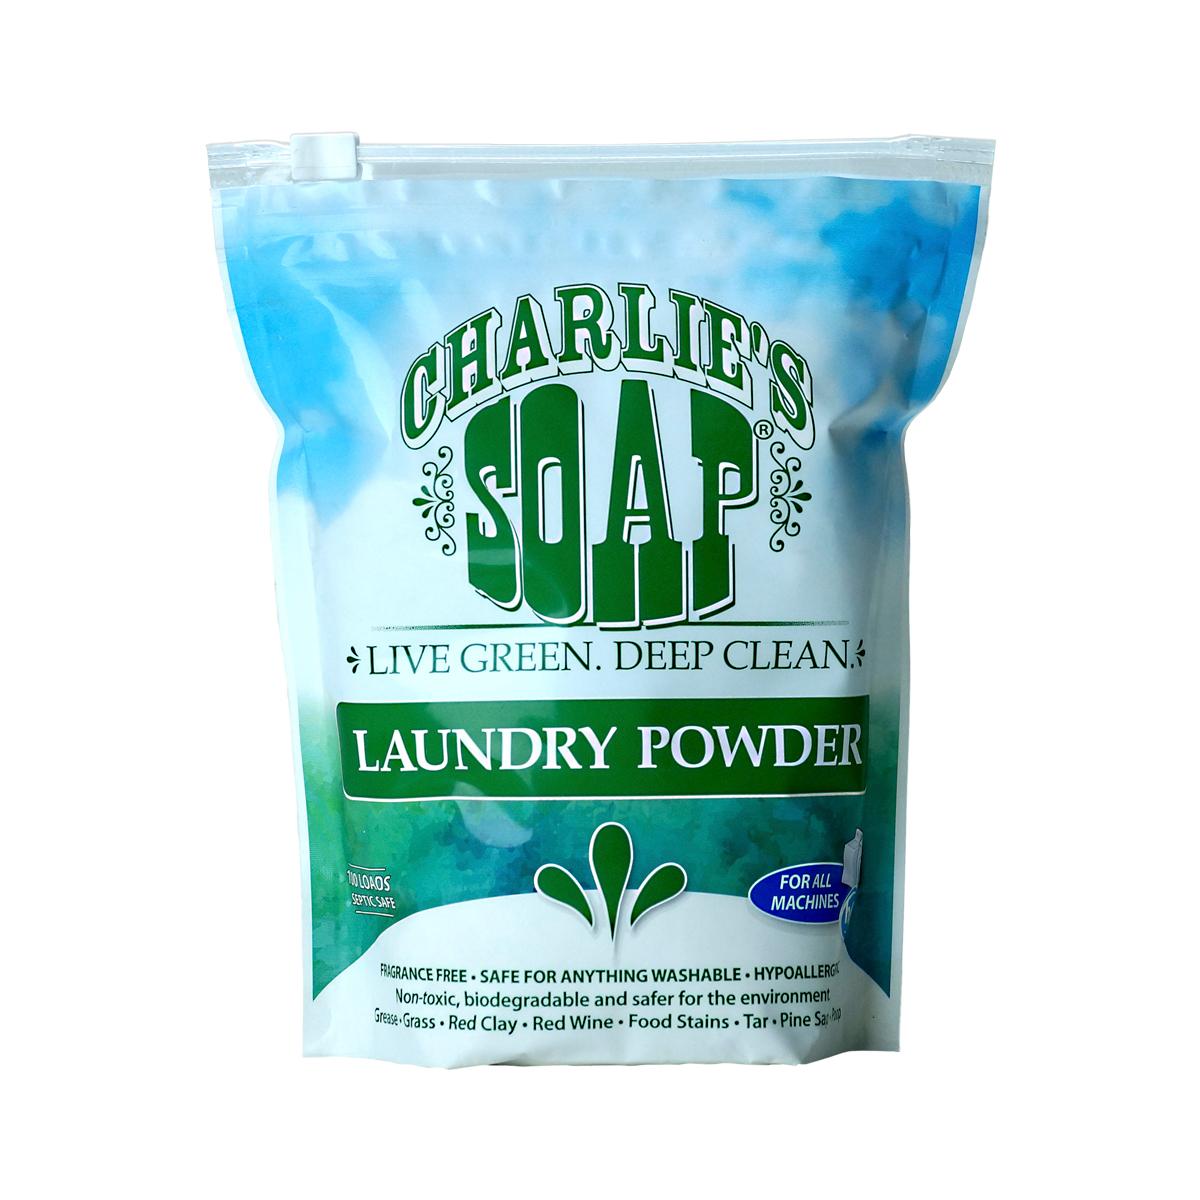 Charlie's Soap Laundry Powder